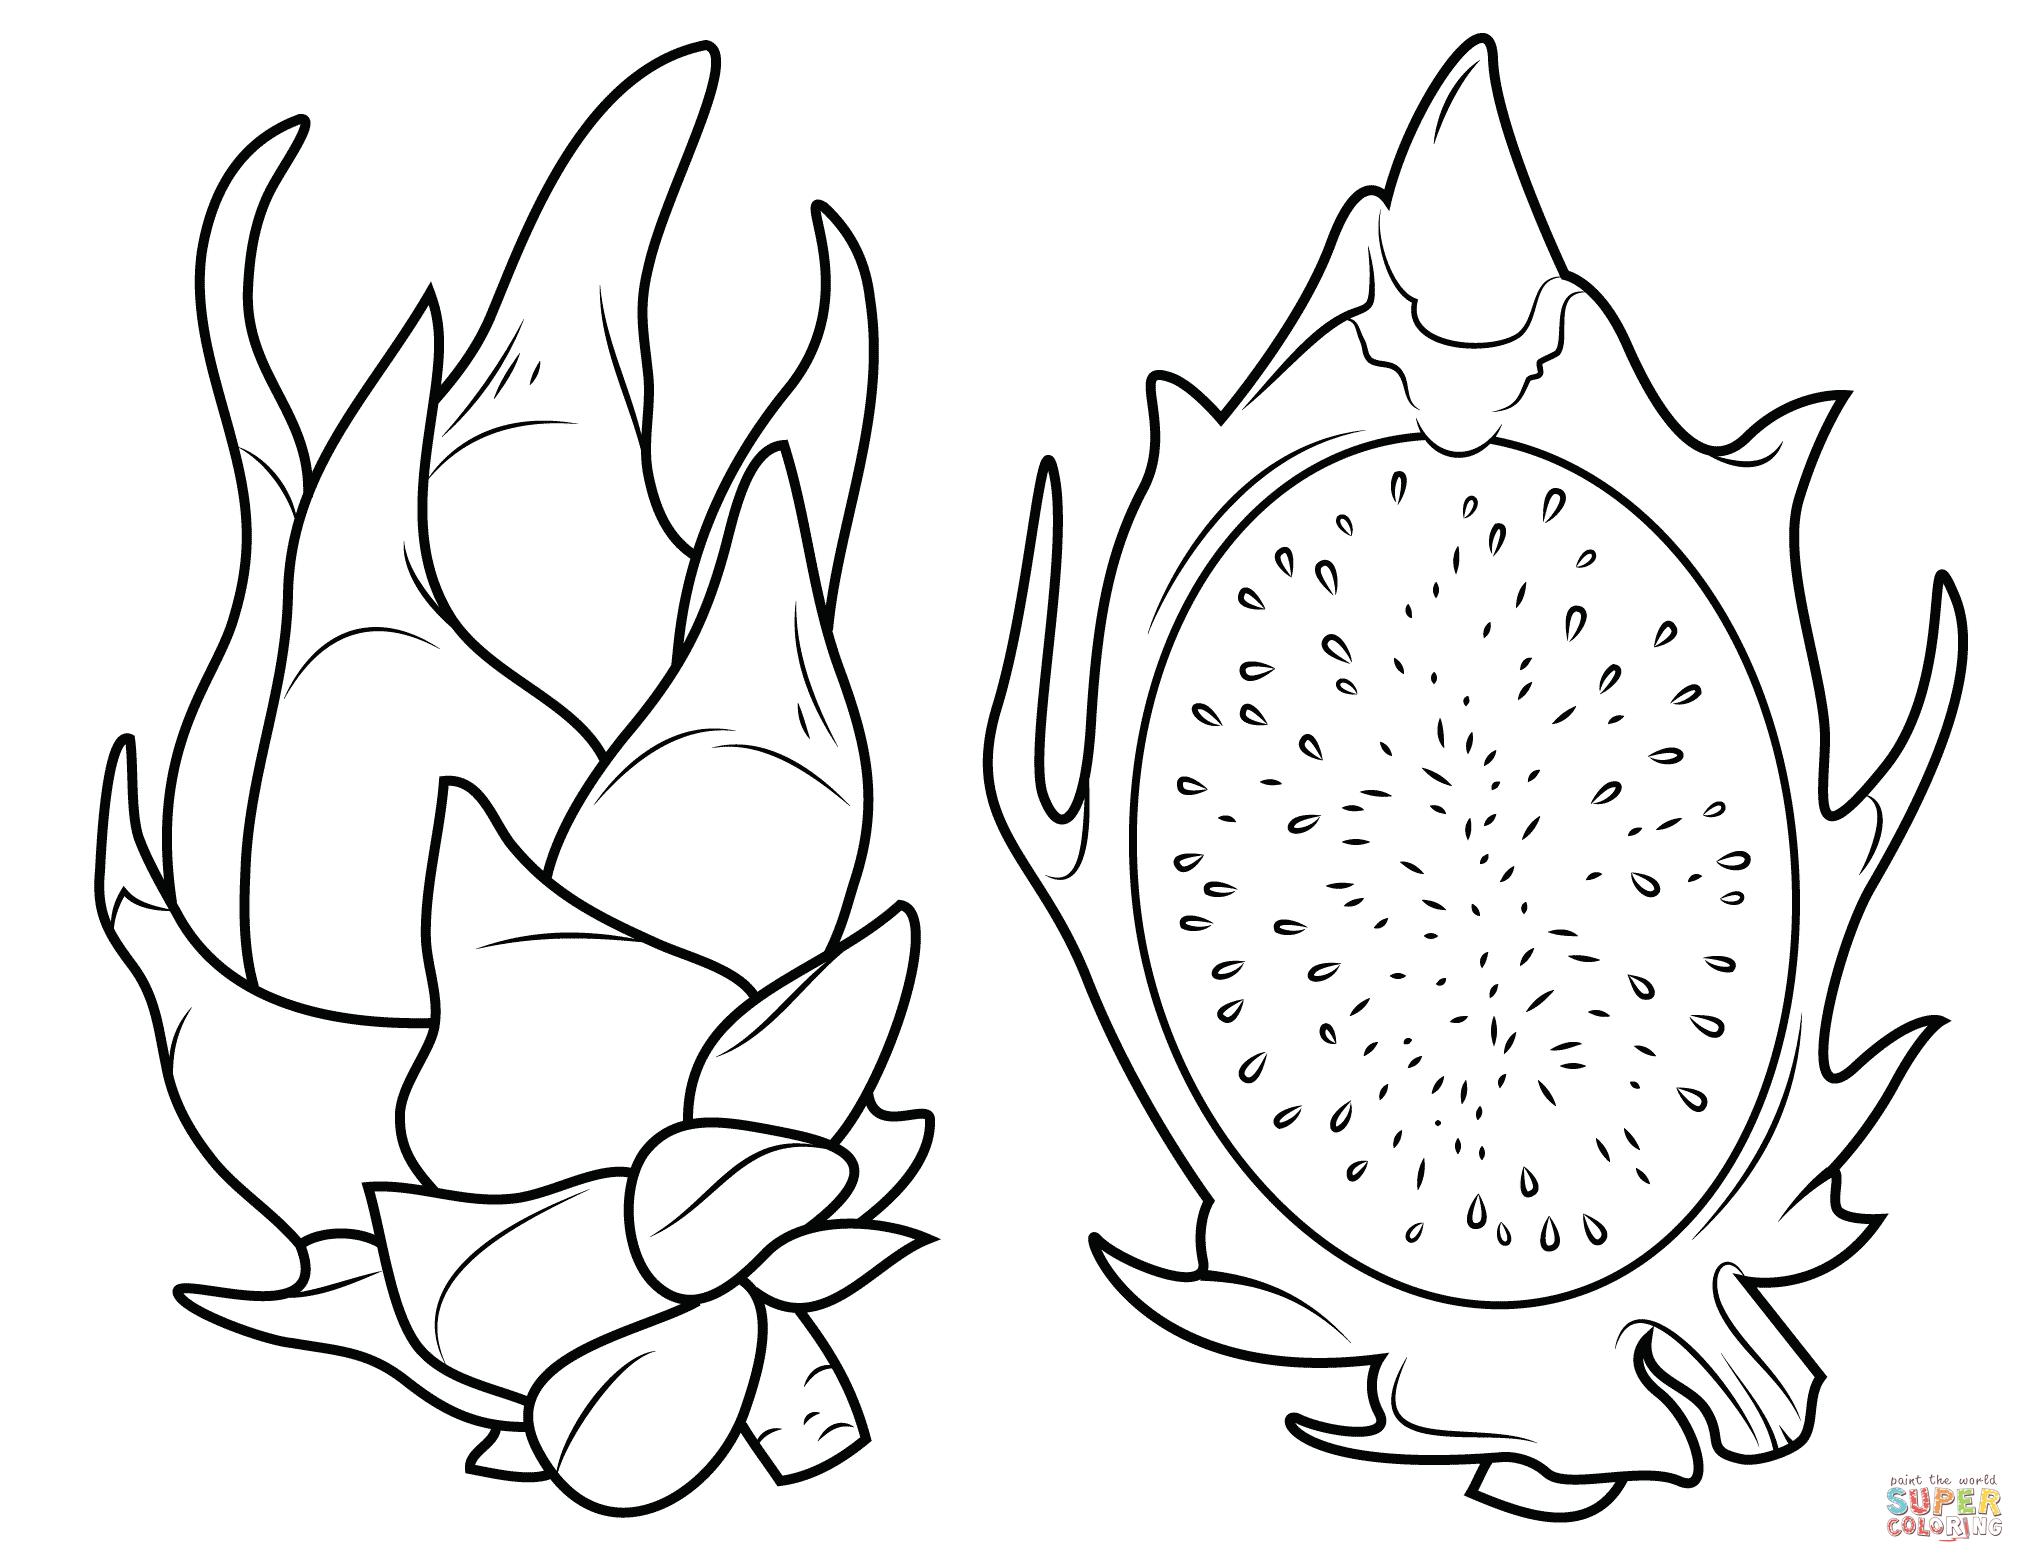 Fruit Drawing At Getdrawings